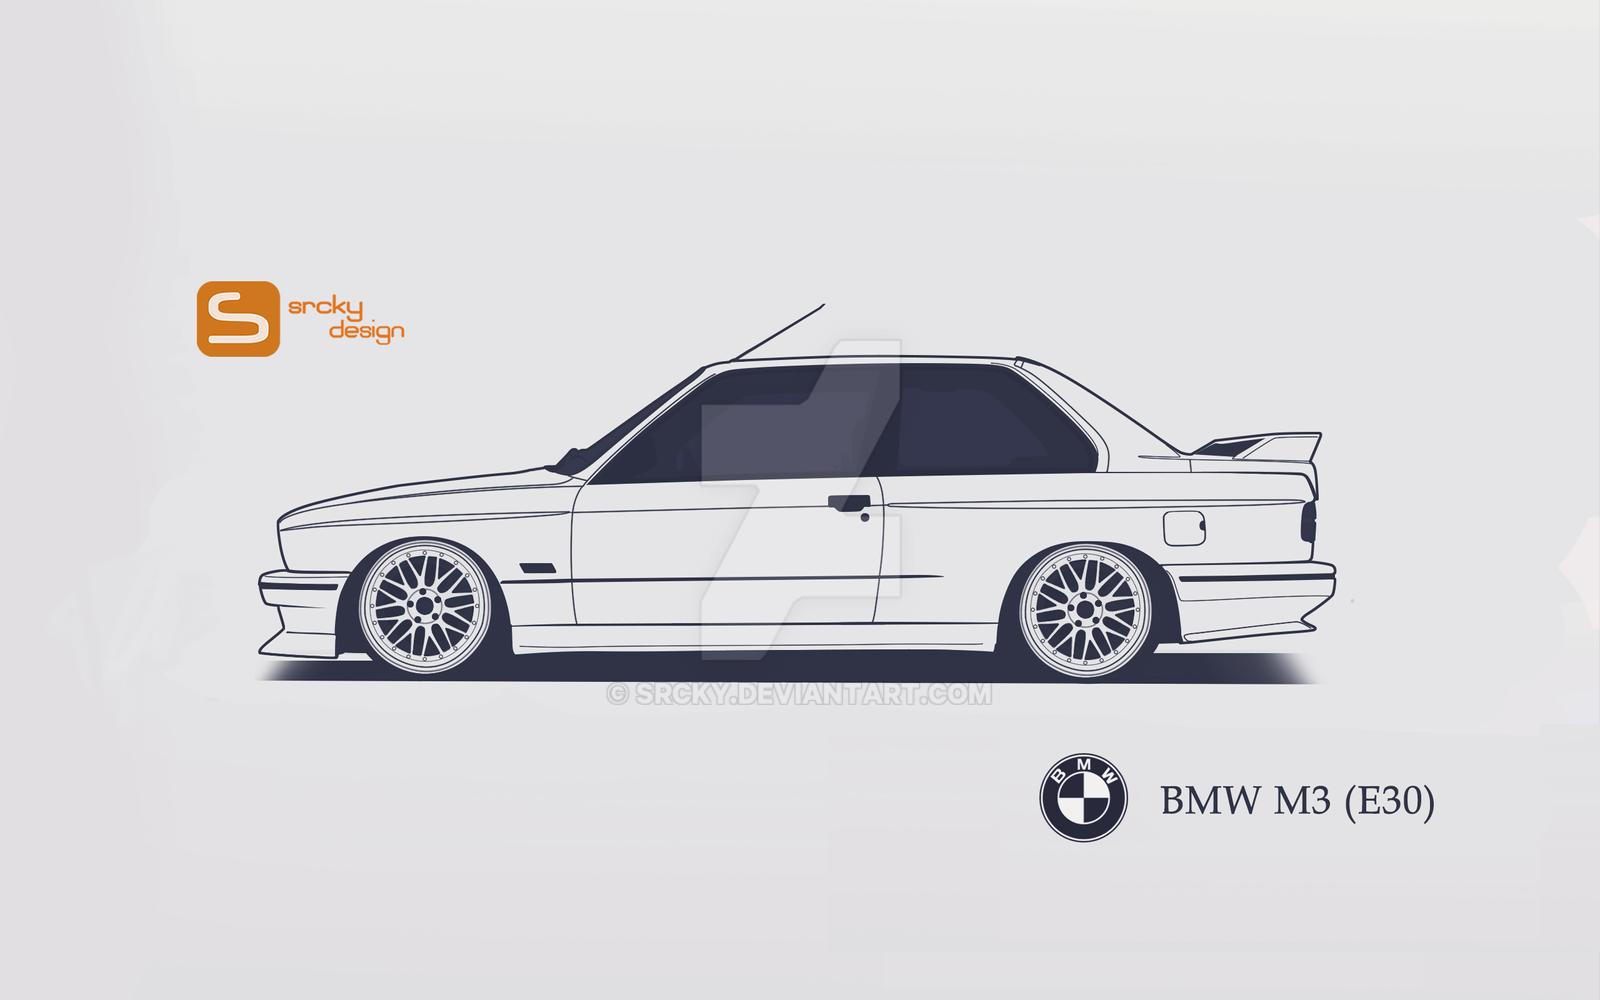 BMW M3 (E30) by SrCky